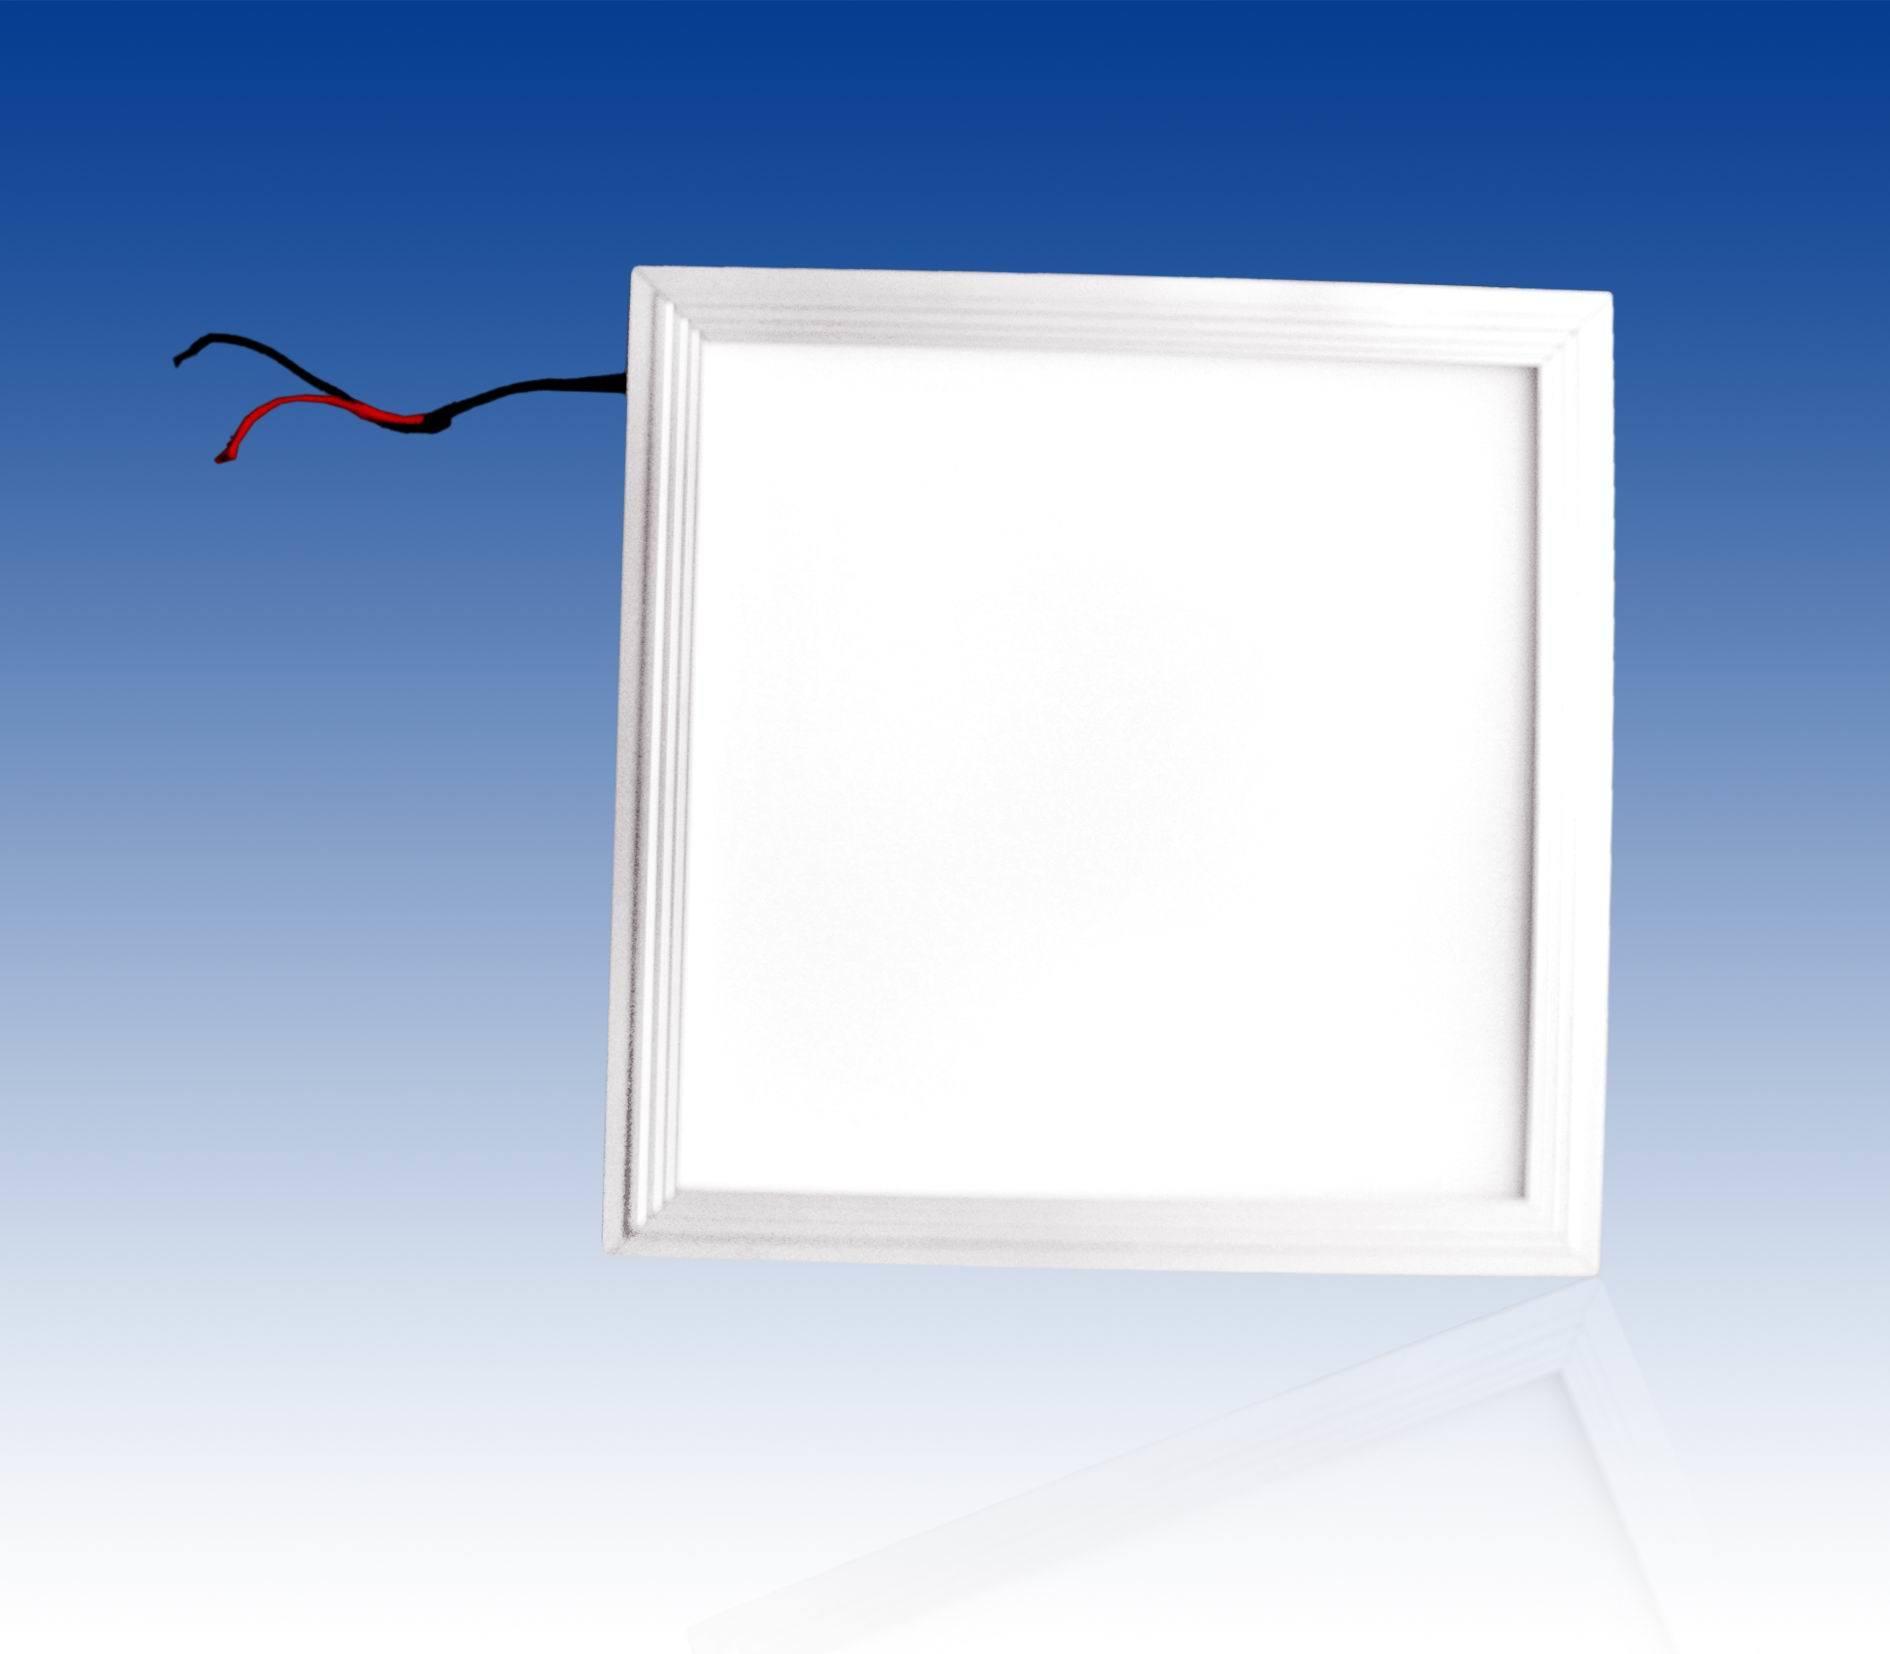 led ceiling light images